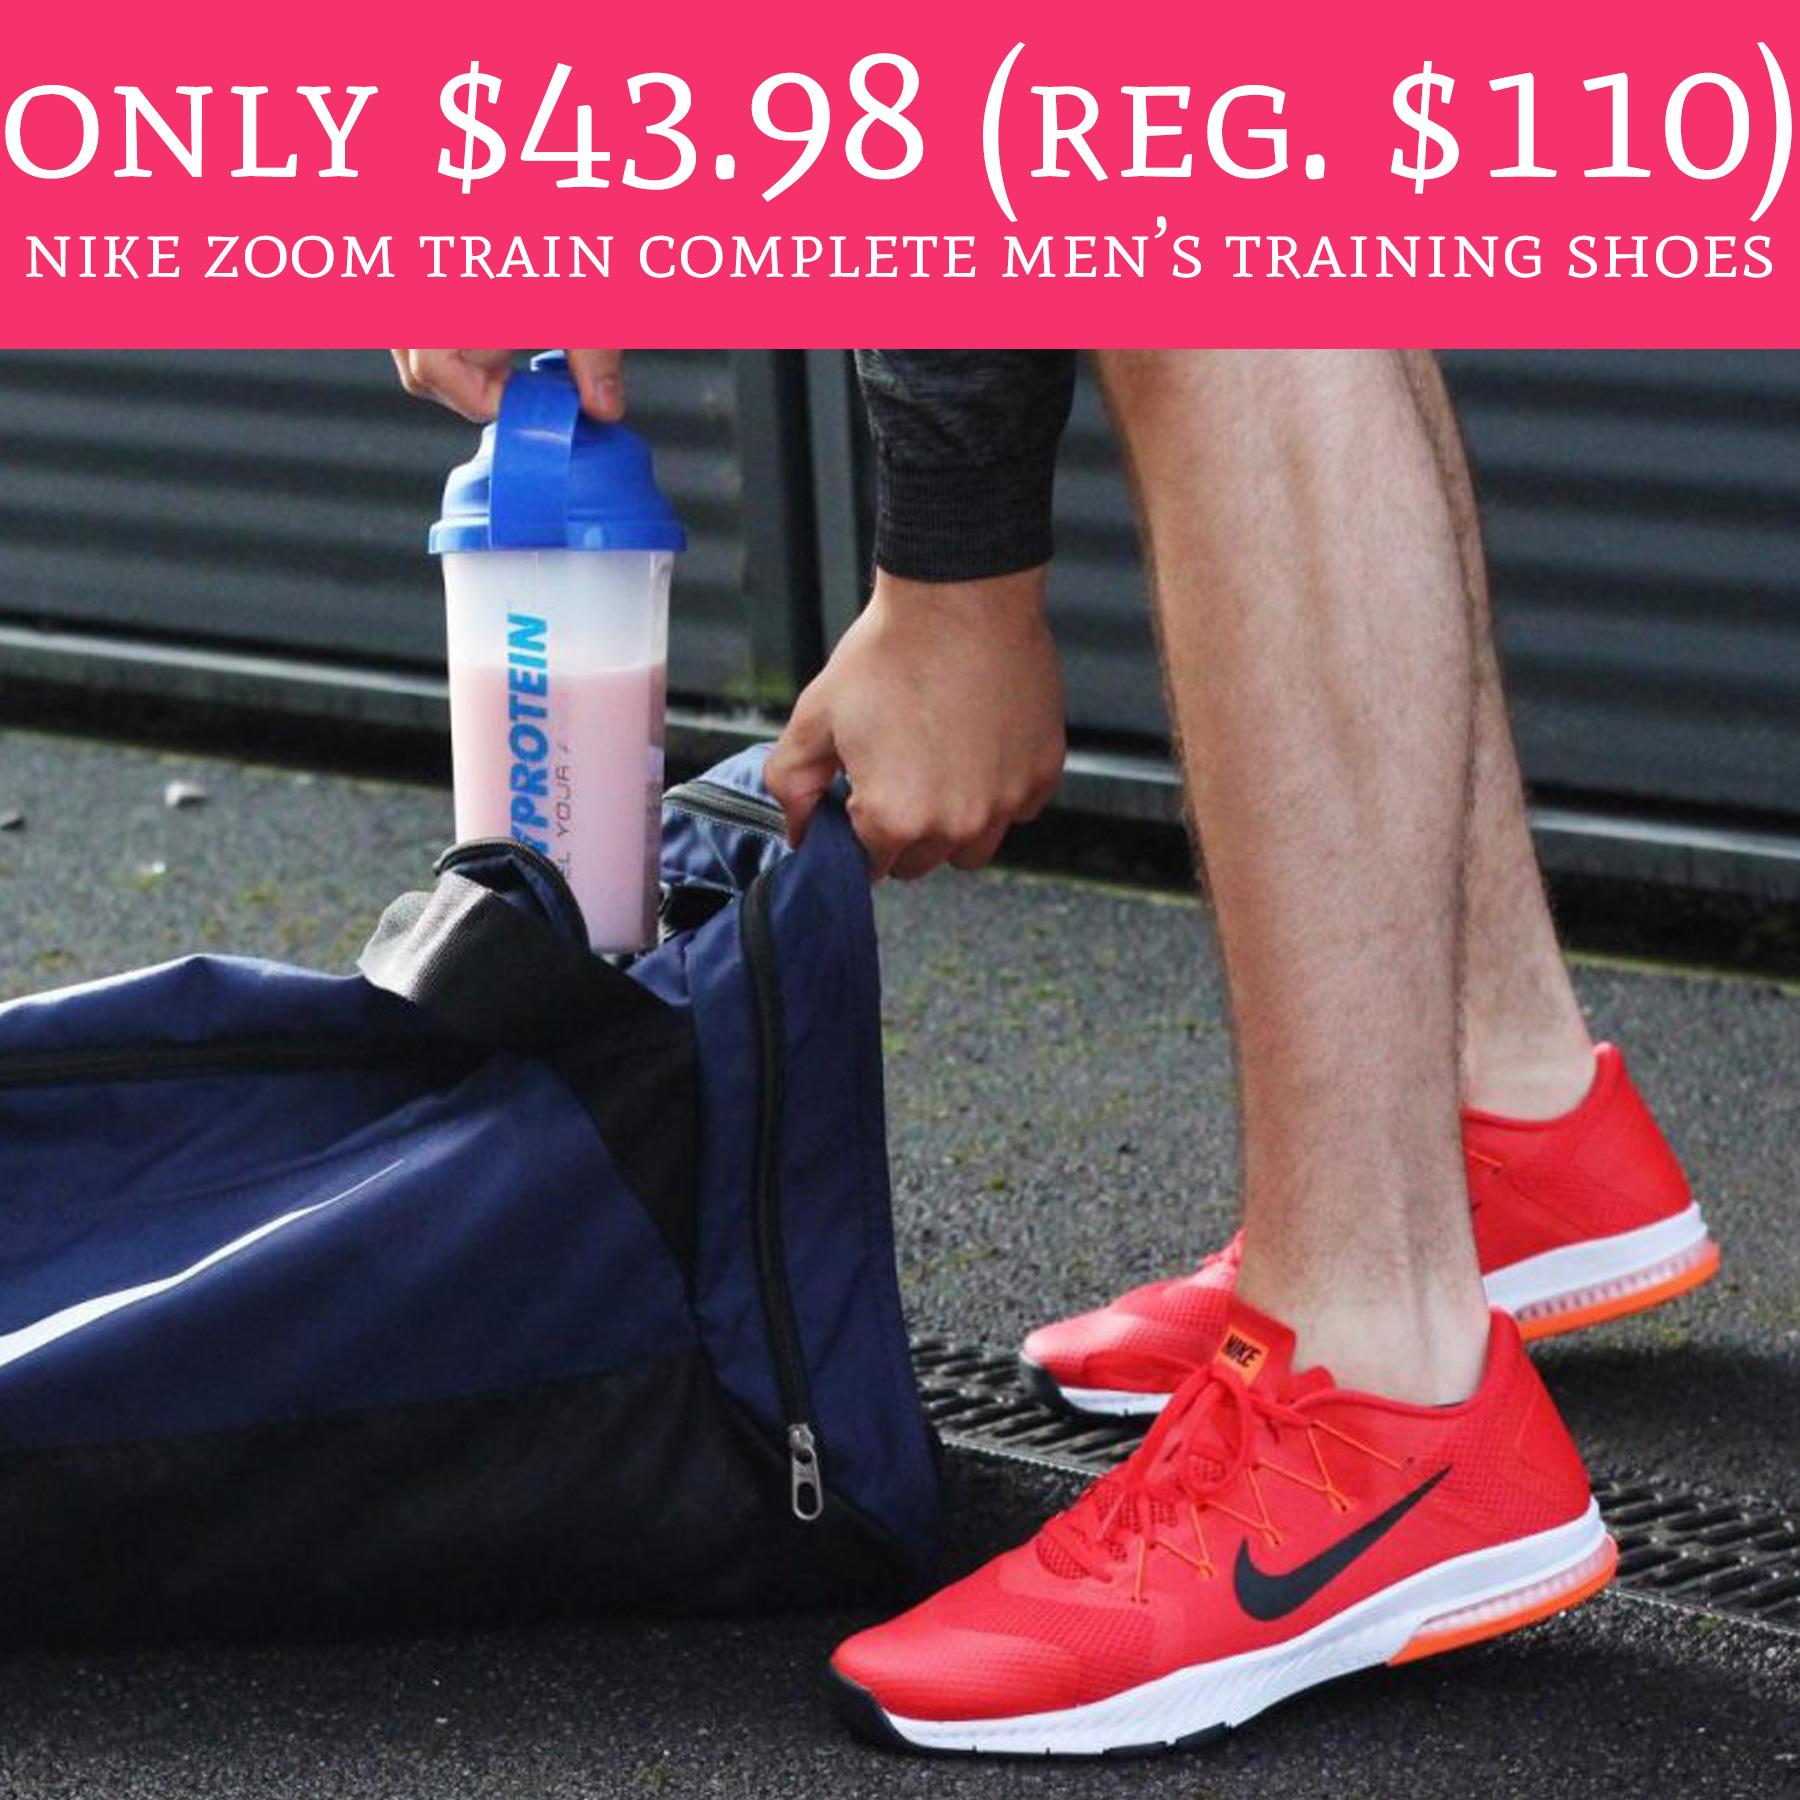 Nike Zoom Train Complete Men's Training